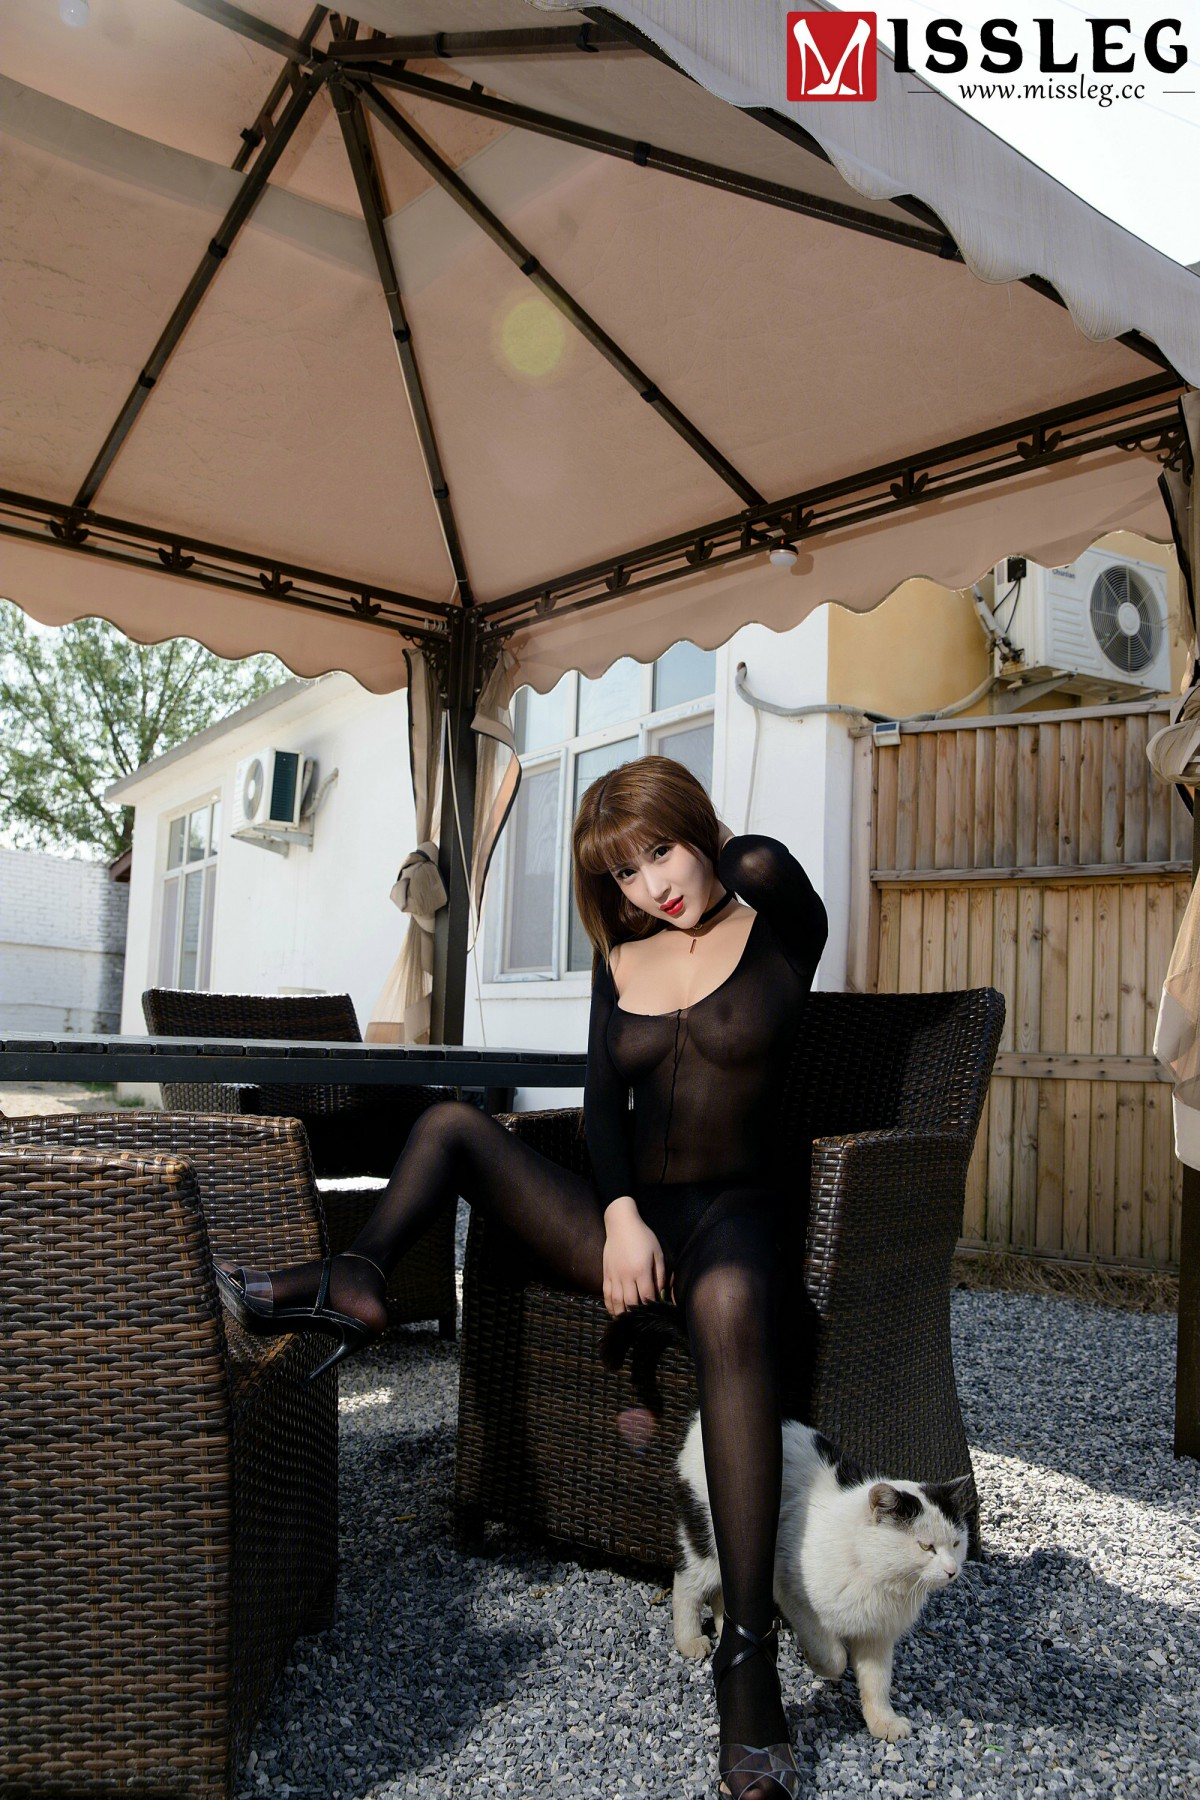 [MISSLEG蜜丝]钻石版 V016 林兮 – 黑色魅影